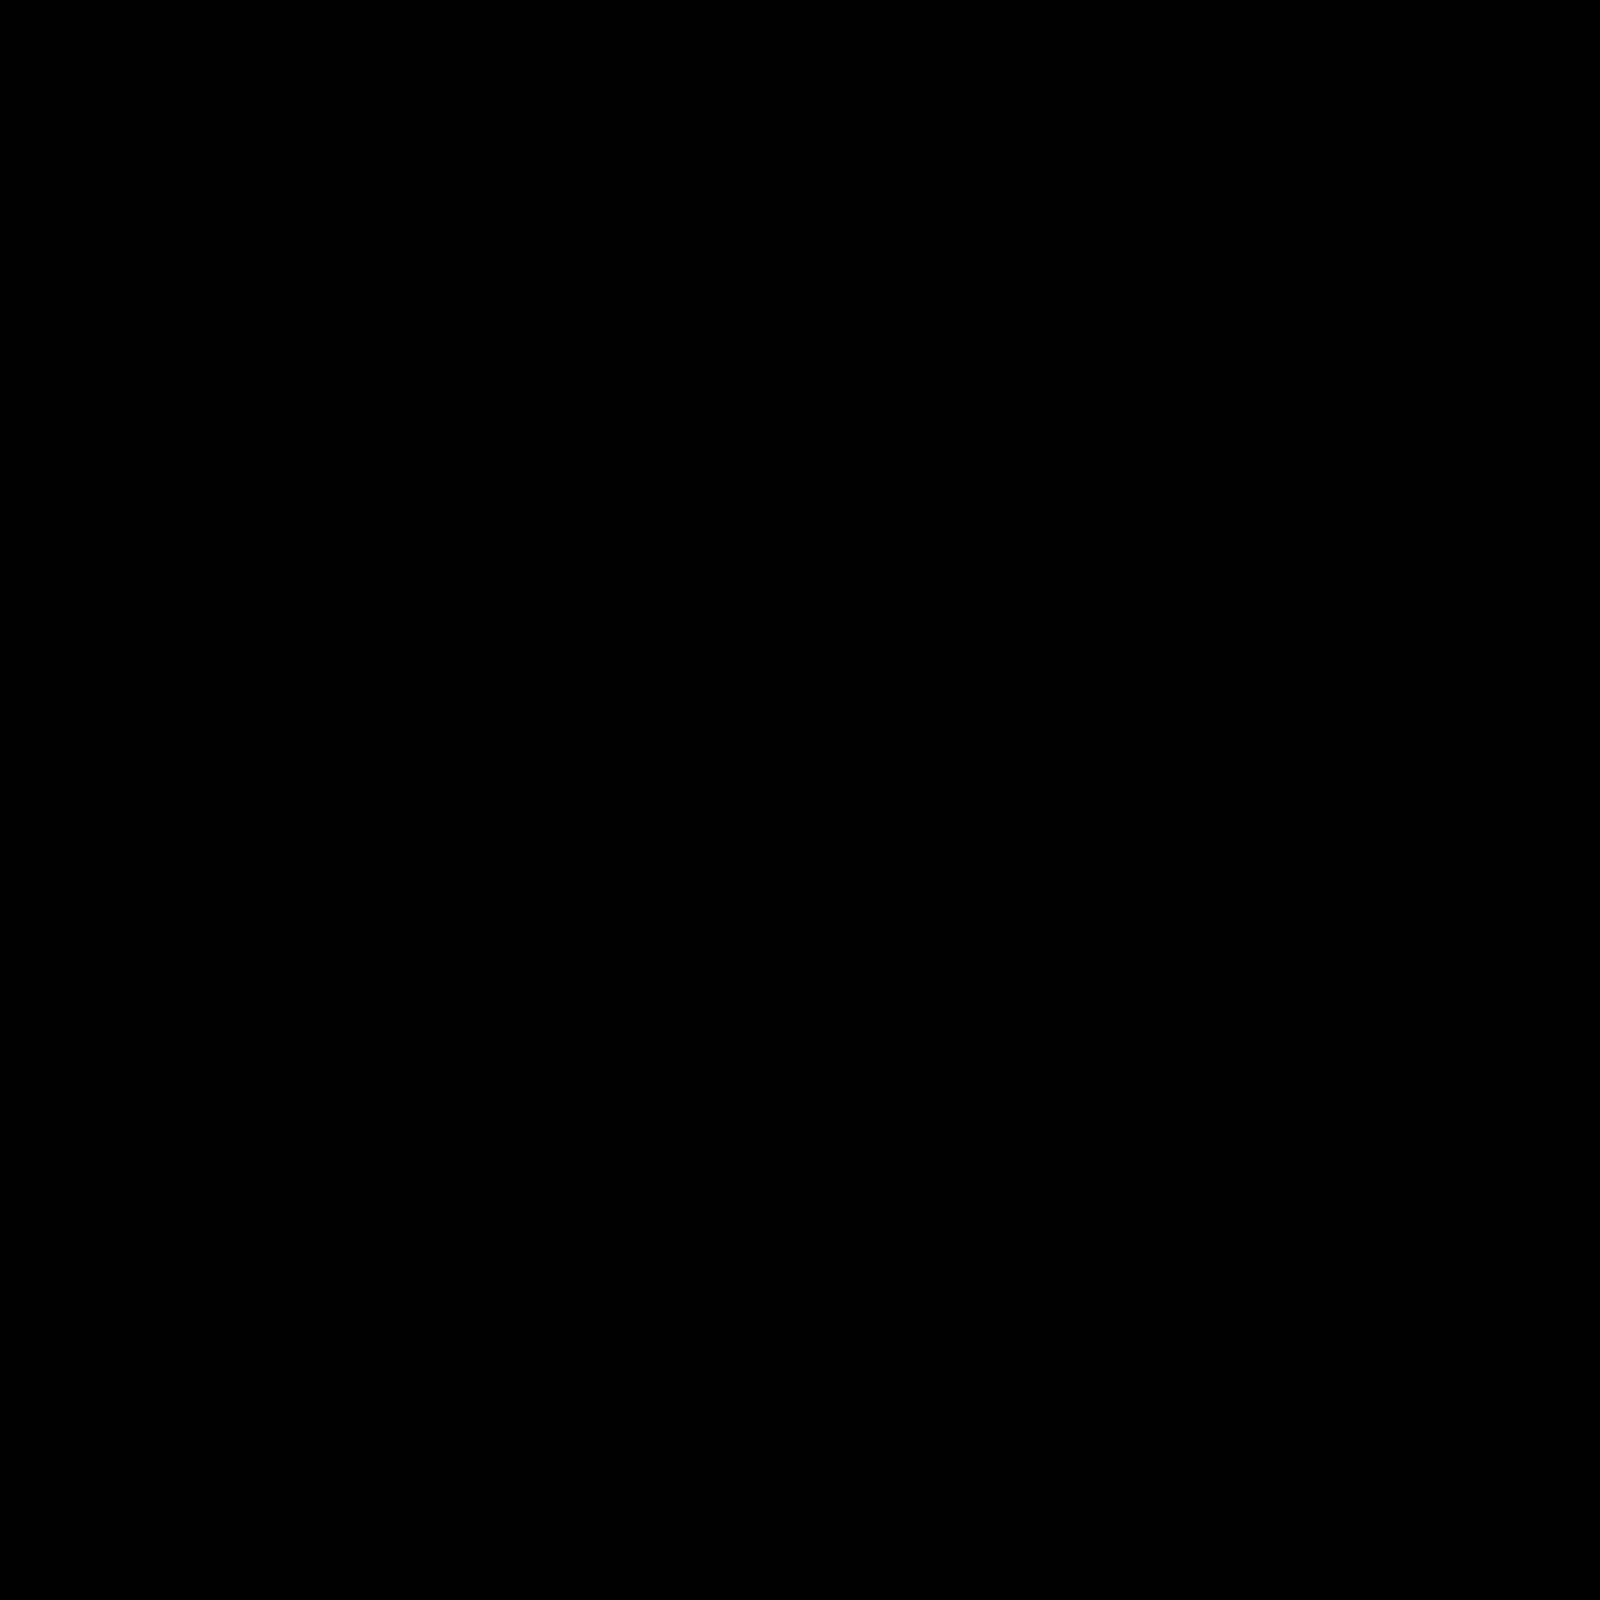 38 icon